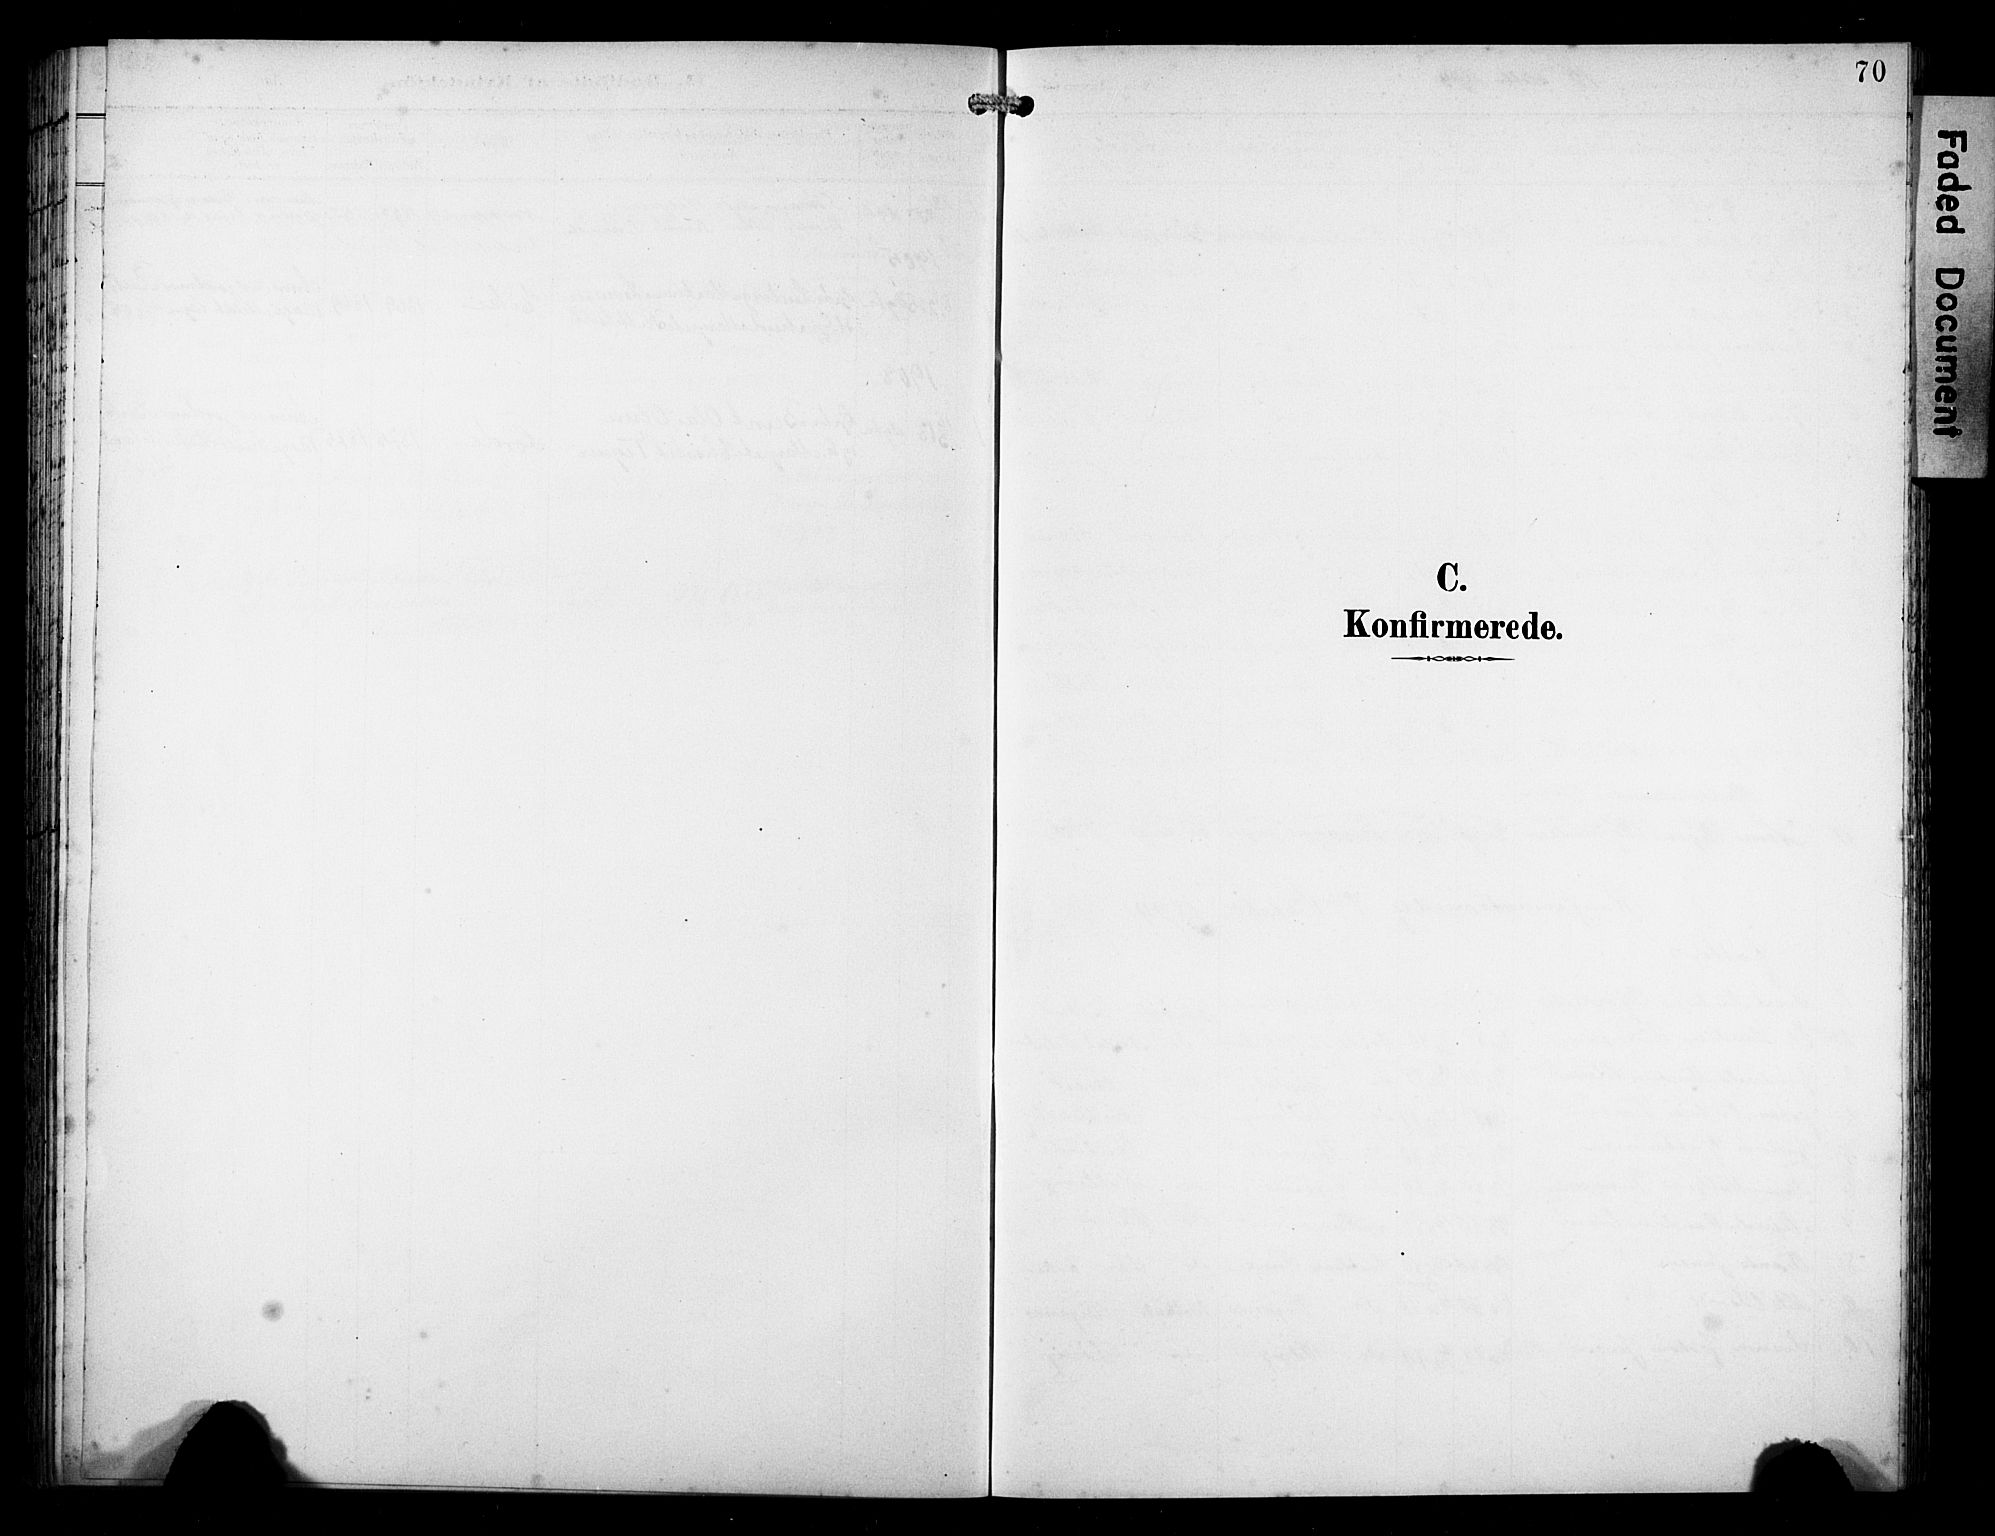 SAST, Avaldsnes sokneprestkontor, H/Ha/Hab/L0011: Klokkerbok nr. B 11, 1893-1929, s. 70